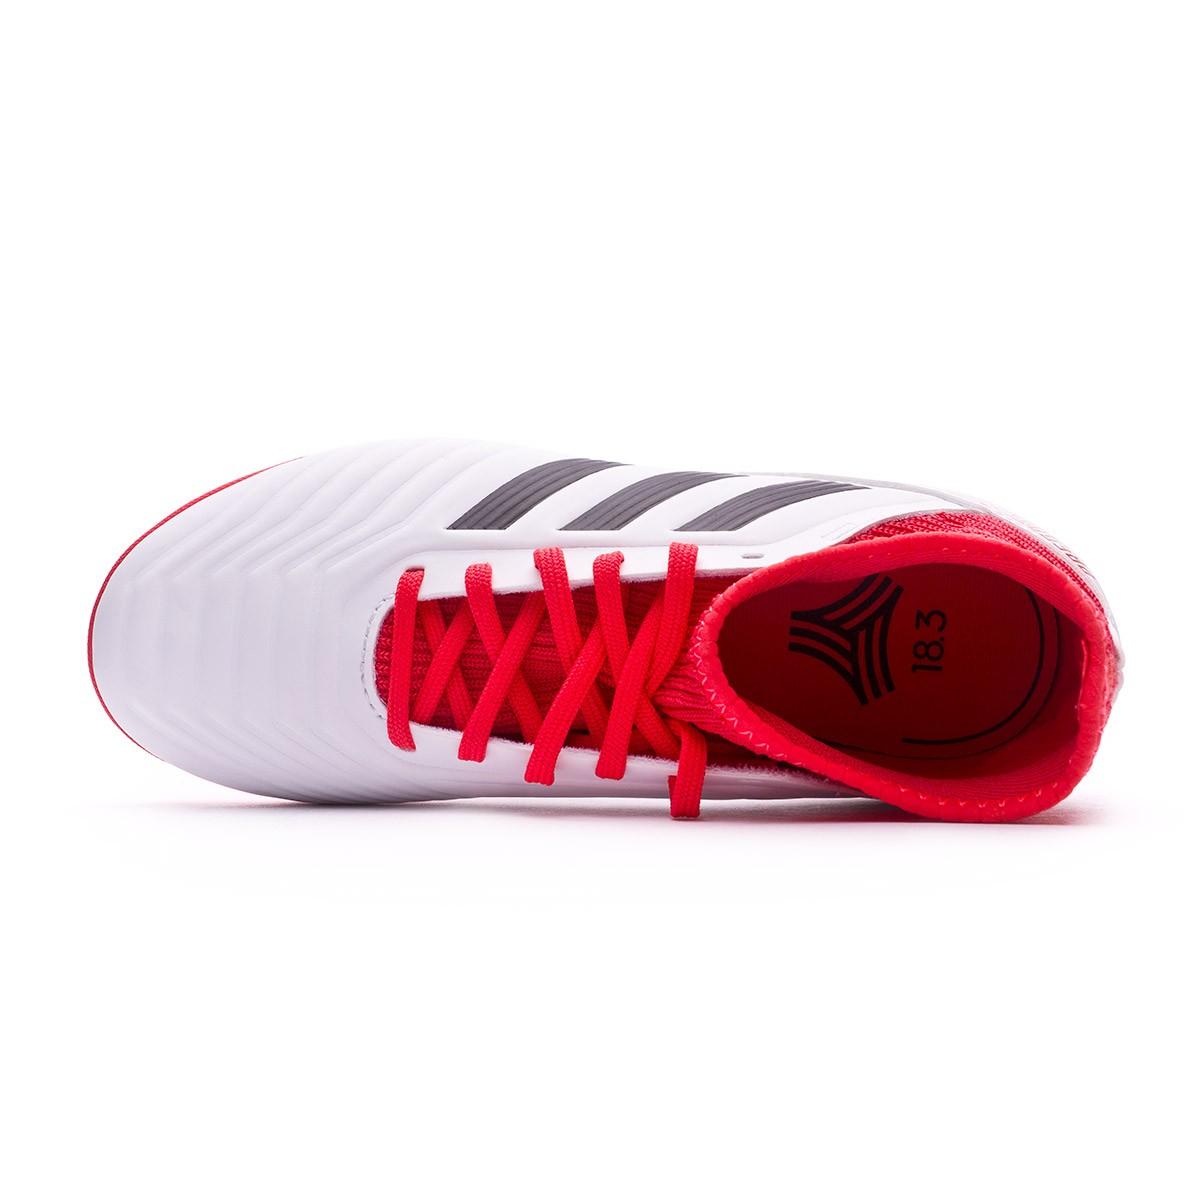 18 Real White Black Niño Core Tango Predator 3 Turf Adidas Zapatilla t0FRvnHqwt